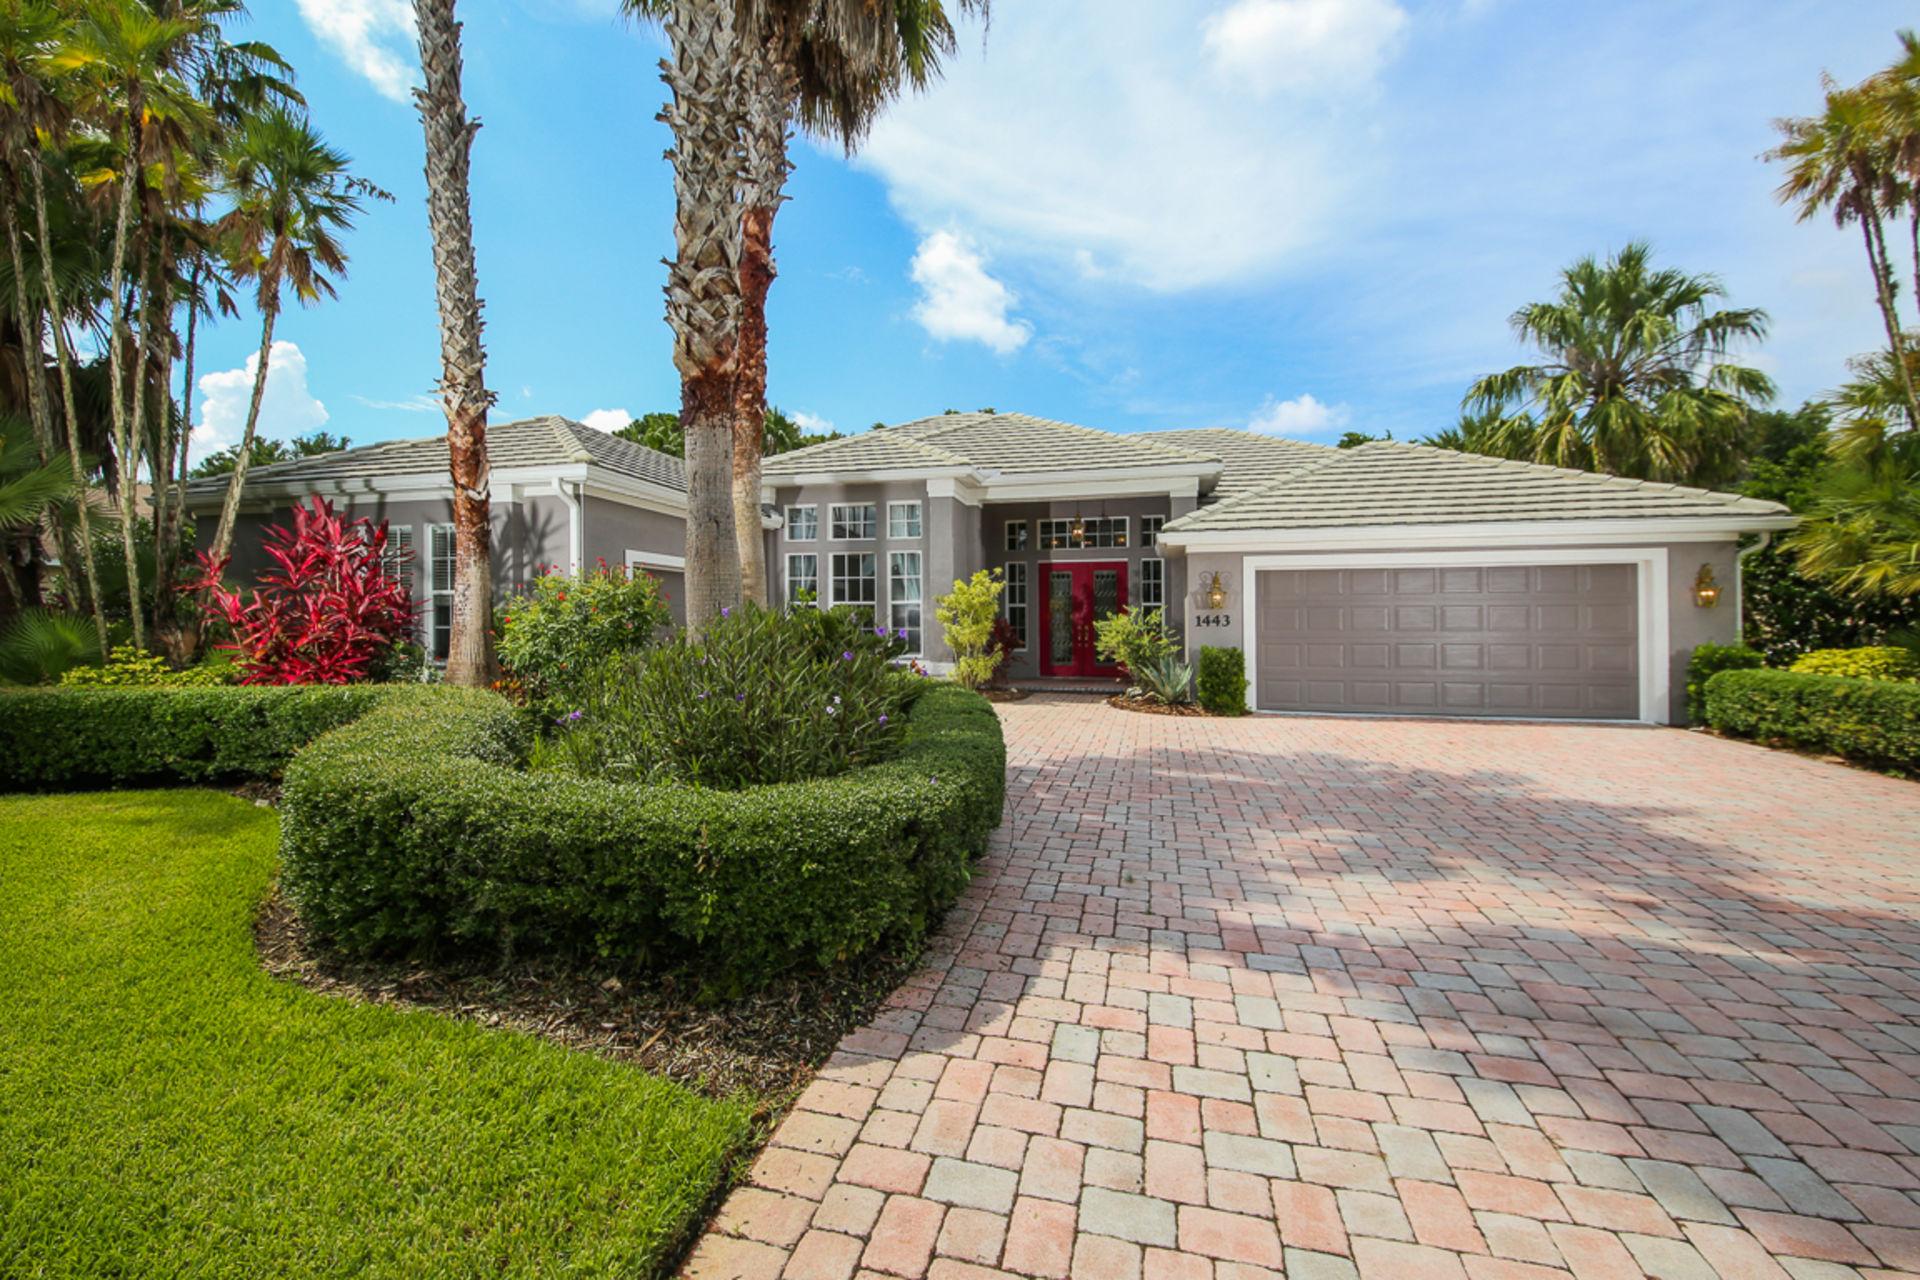 1443 Brambling Ct For Sale, Bradenton Florida